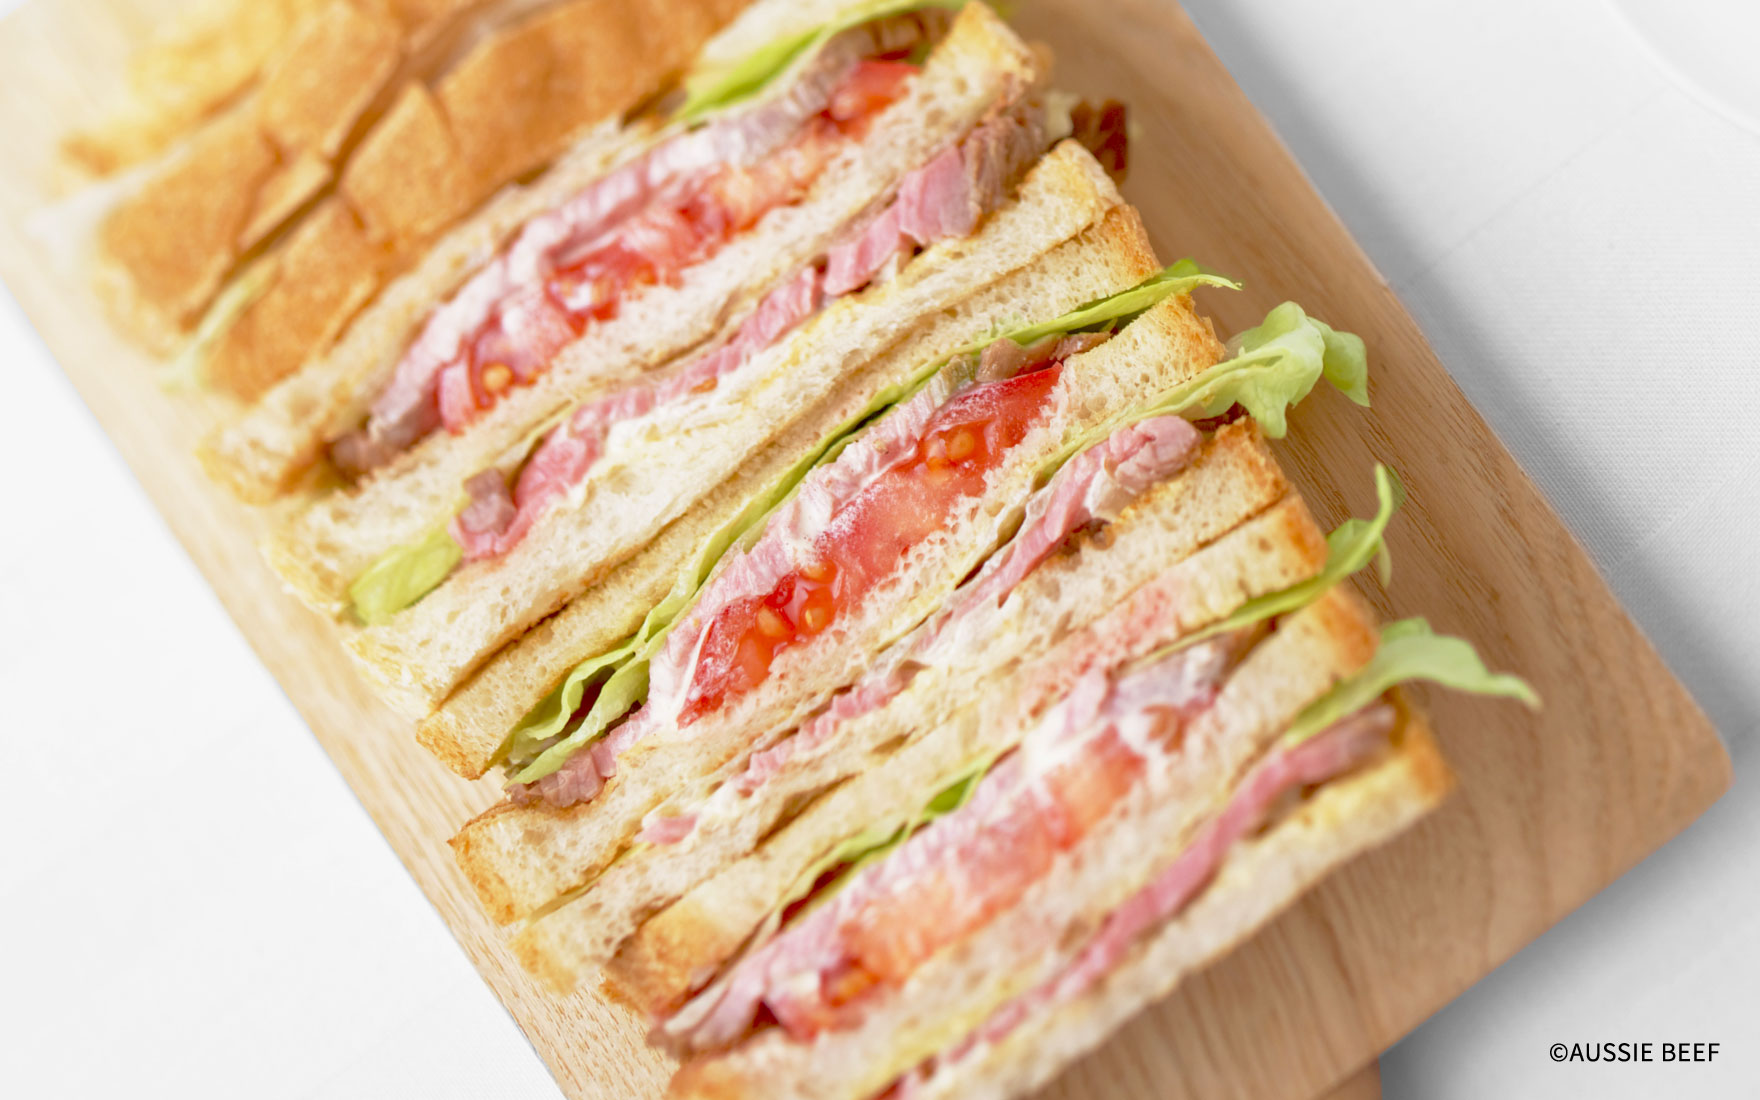 BLT風サンドイッチ